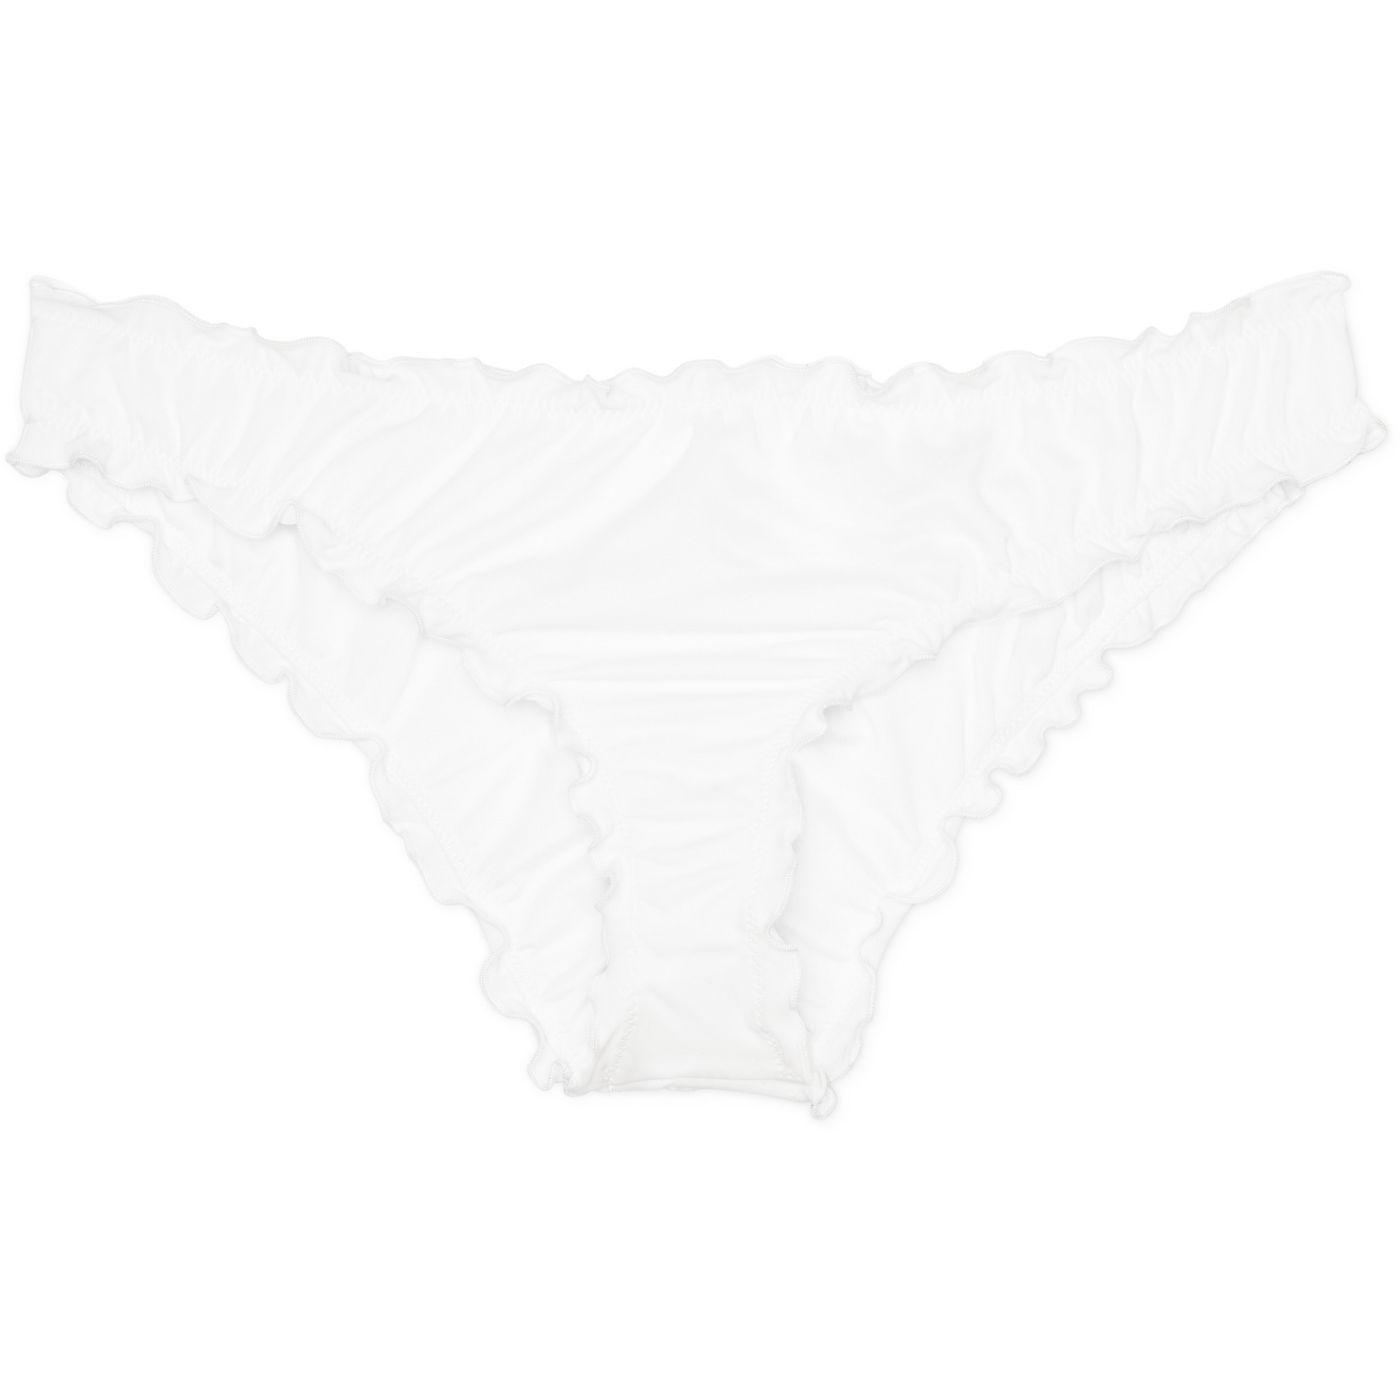 Women's Wave Ruffle Cheeky Bikini Bottom - Shade & Shore - image 4 of 15